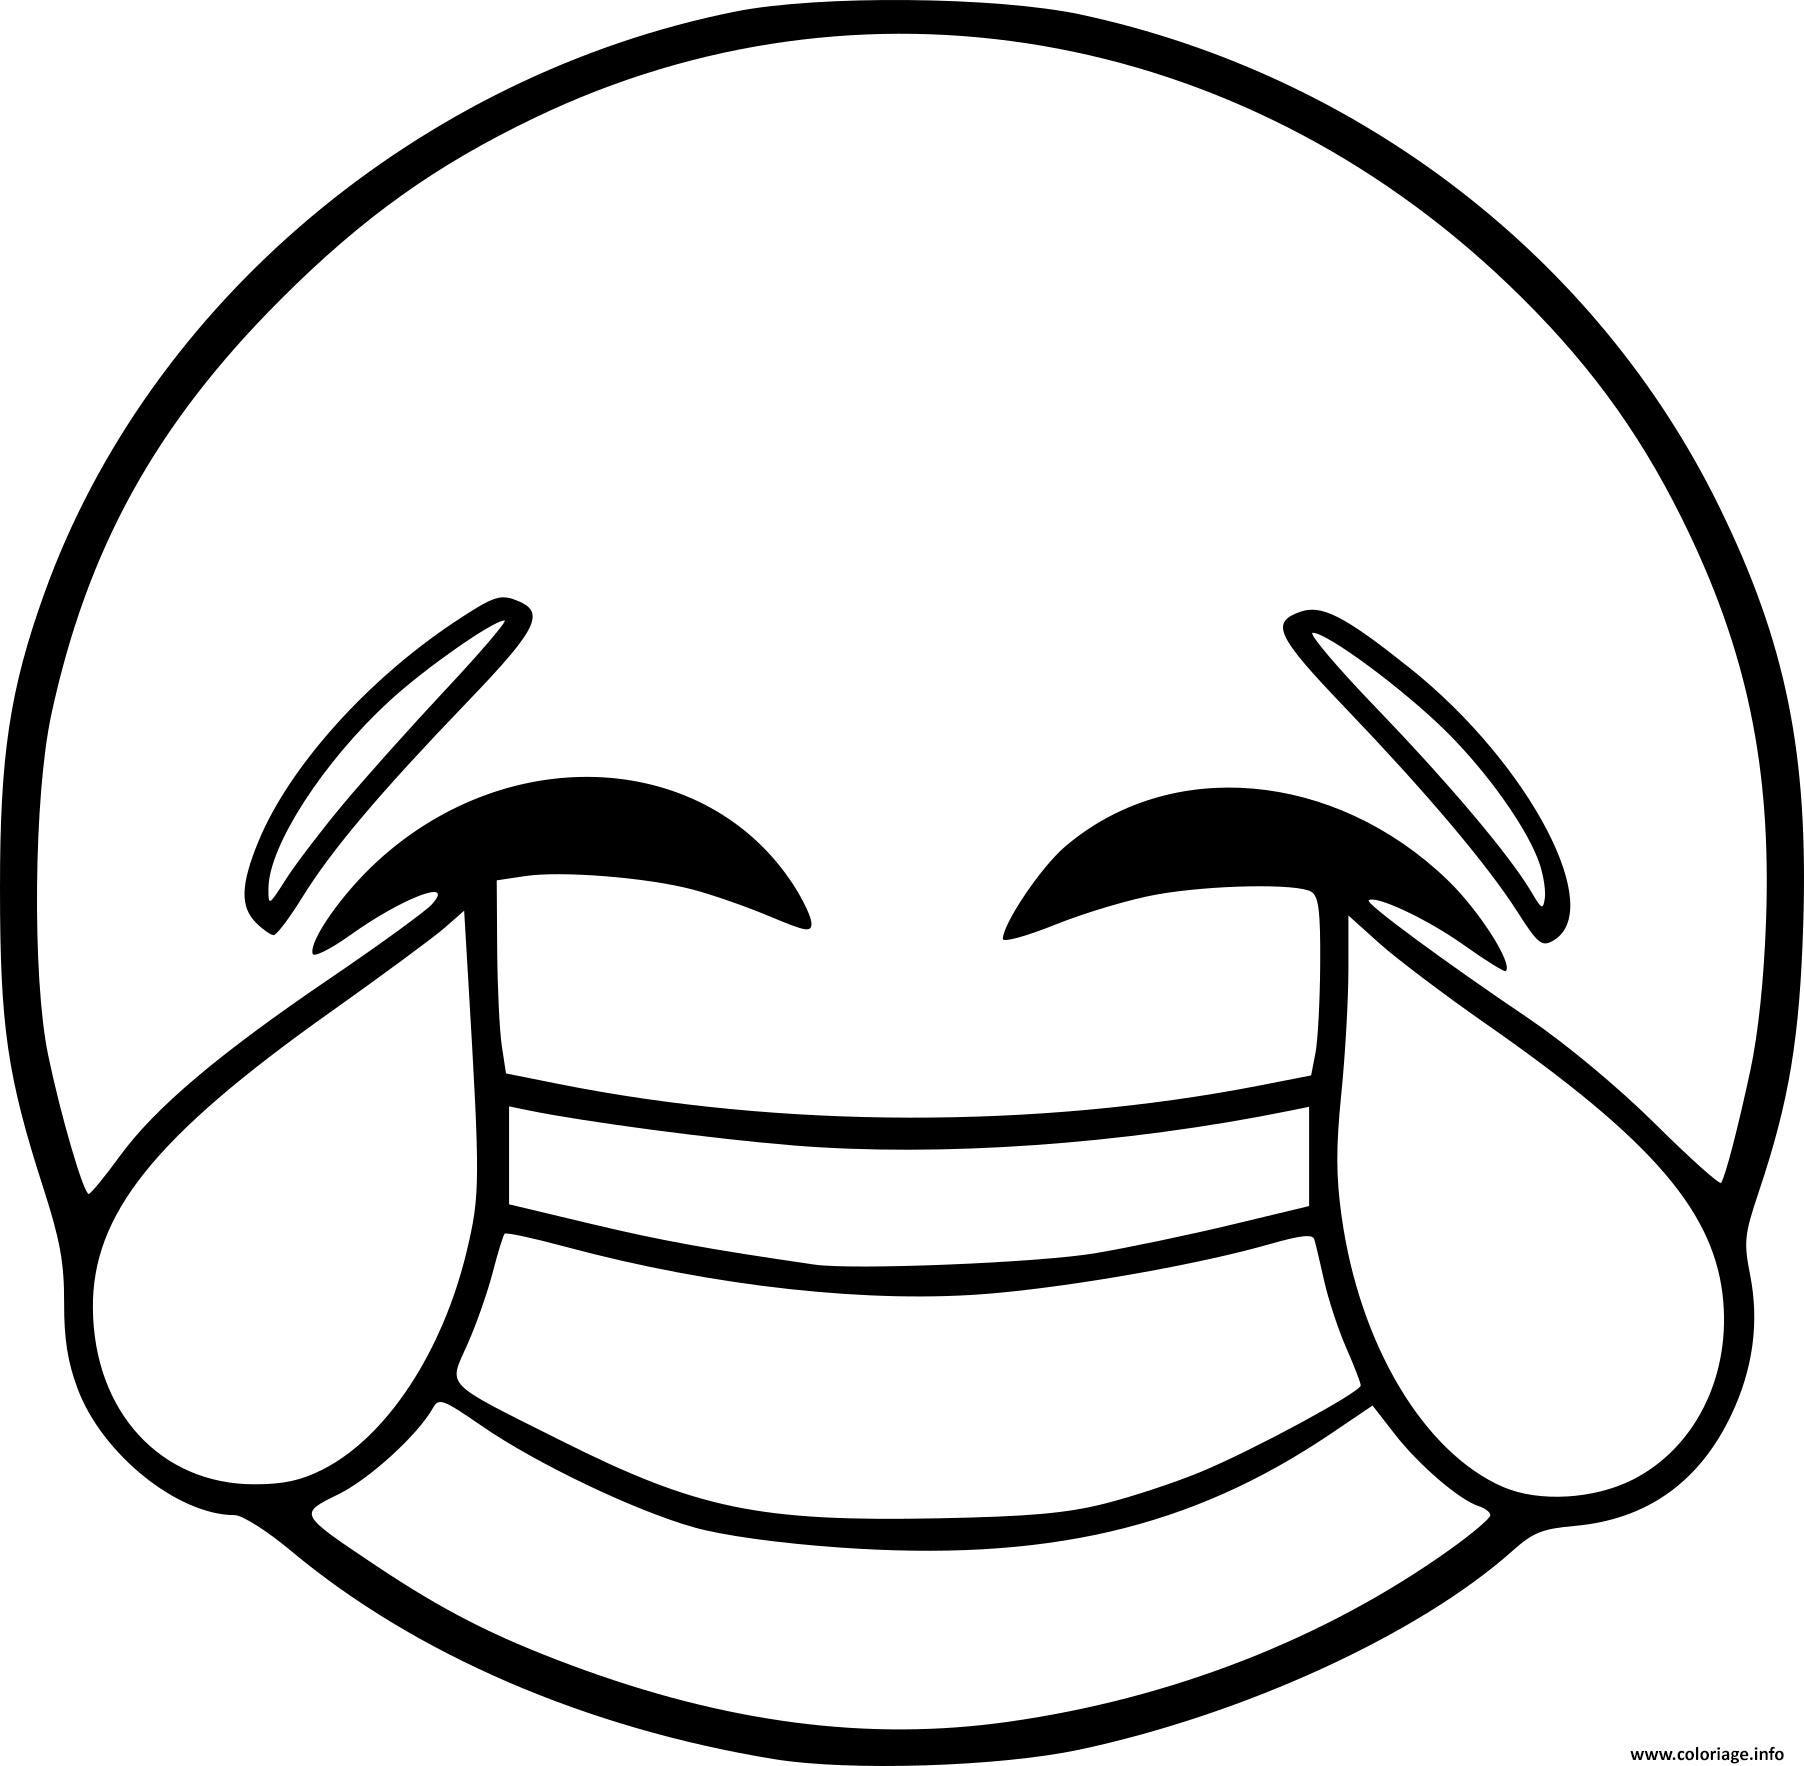 Coloriage Smiley Emoji Rire Dessin Nouveau Coloriage Smiley Emoji Rire Dessin Coloriage Imprimer Emoji Tend Emoji Drawings Emoji Coloring Pages Laughing Emoji